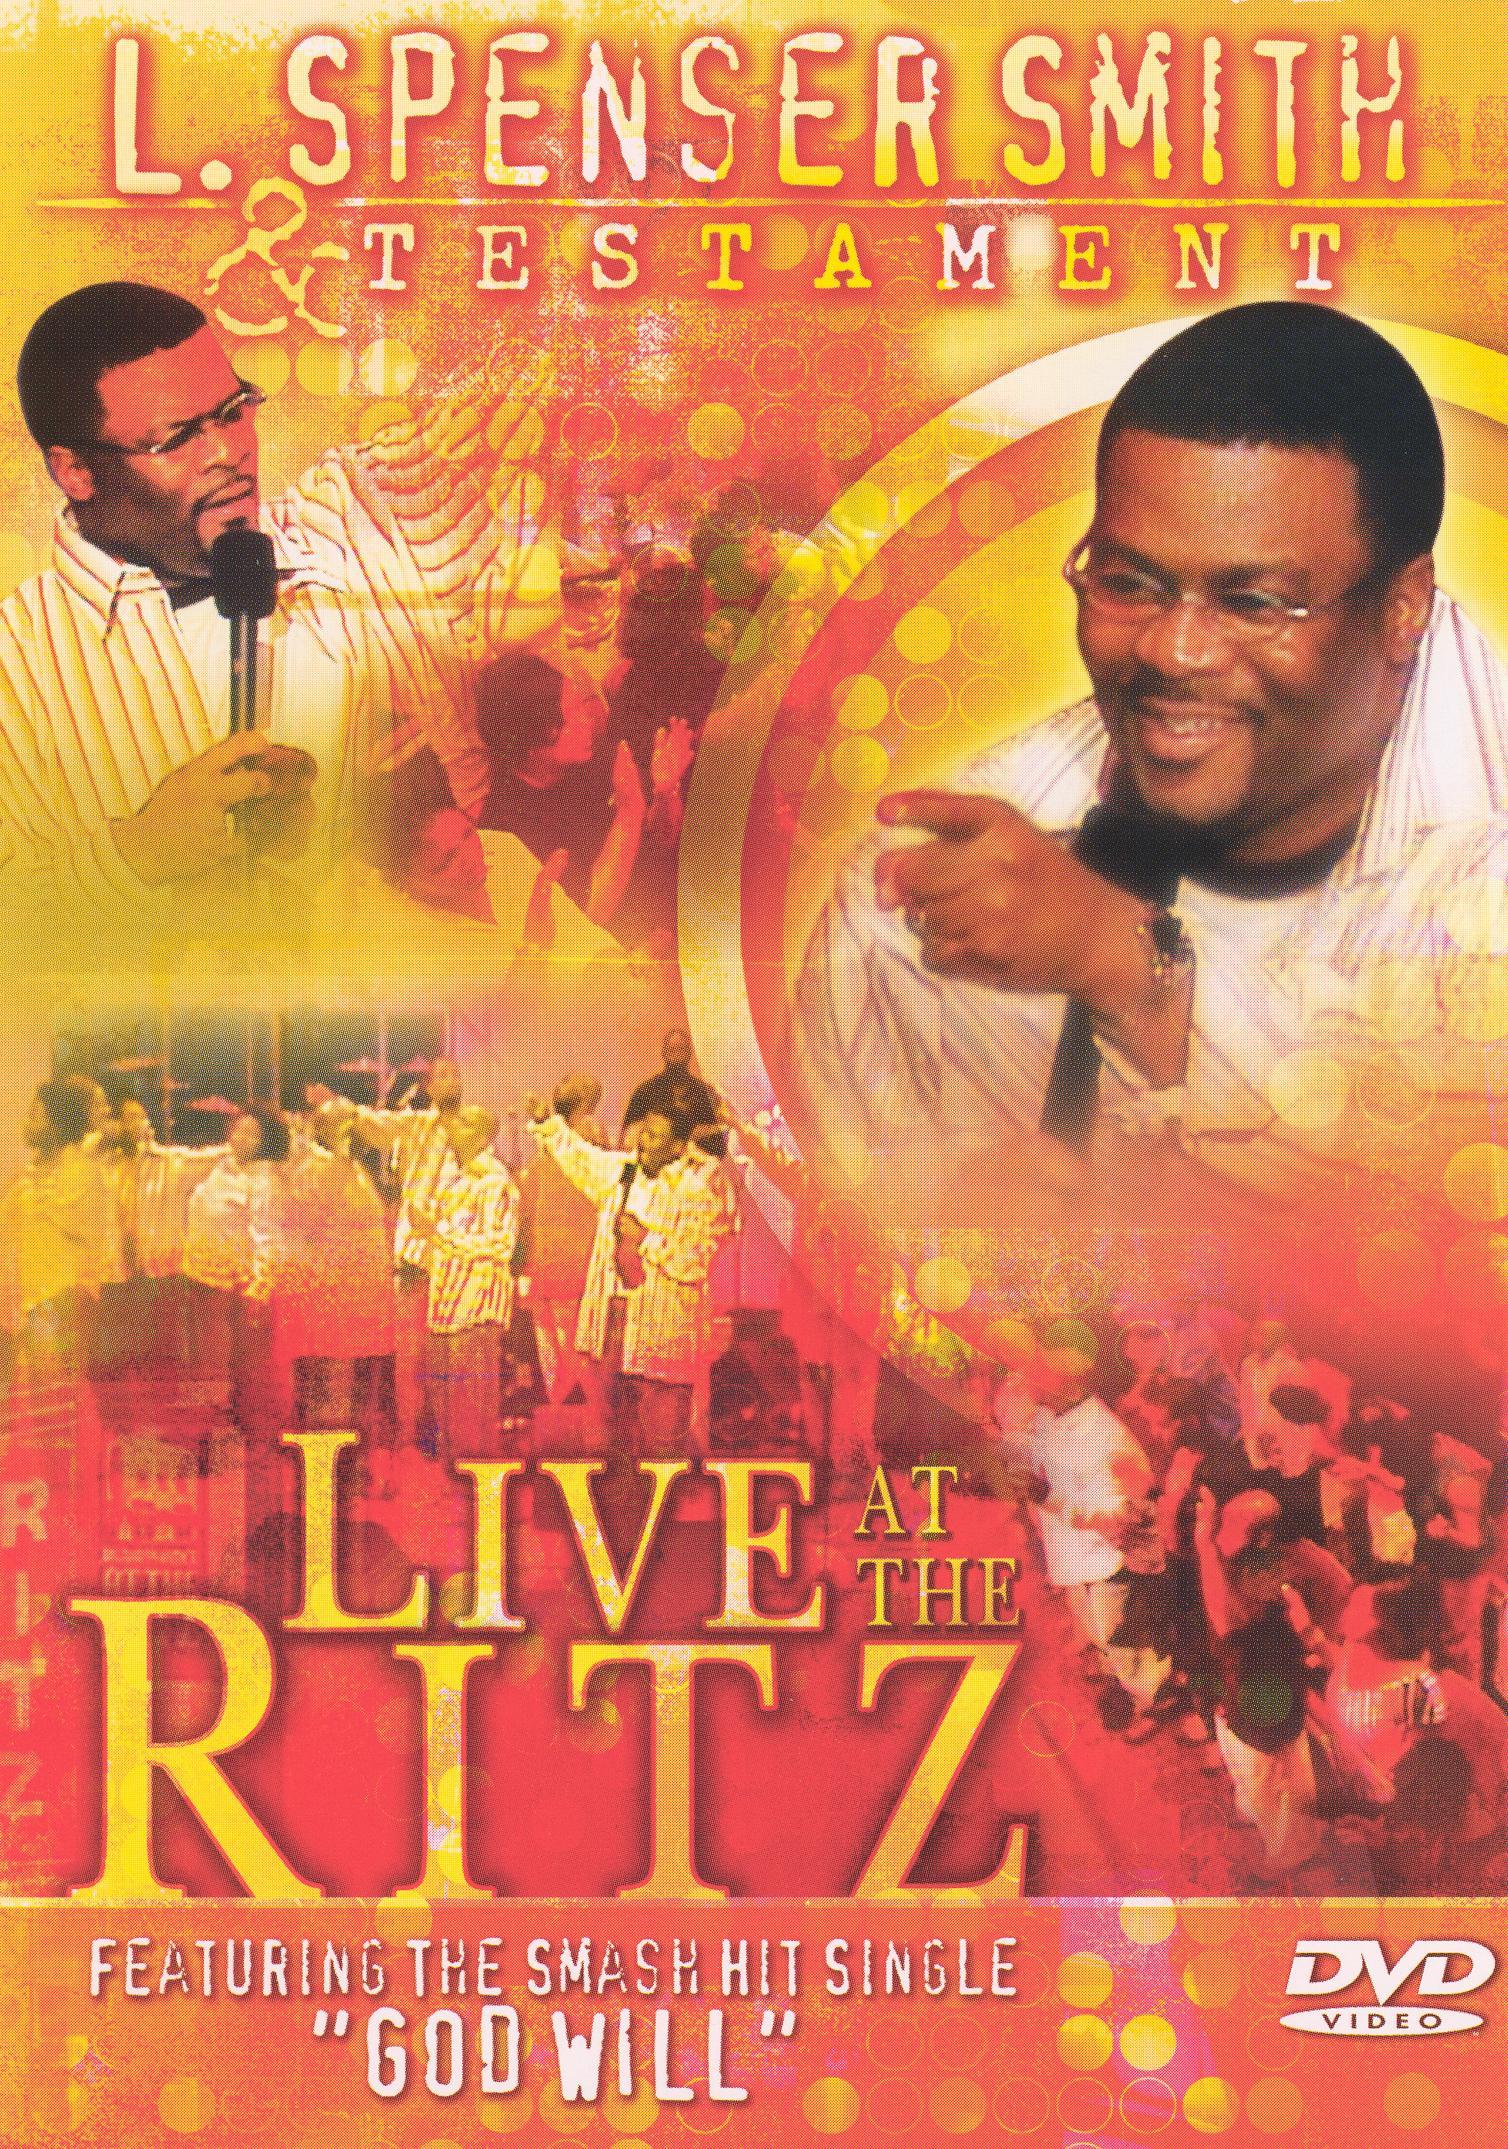 L. Spenser Smith: Live At the Ritz